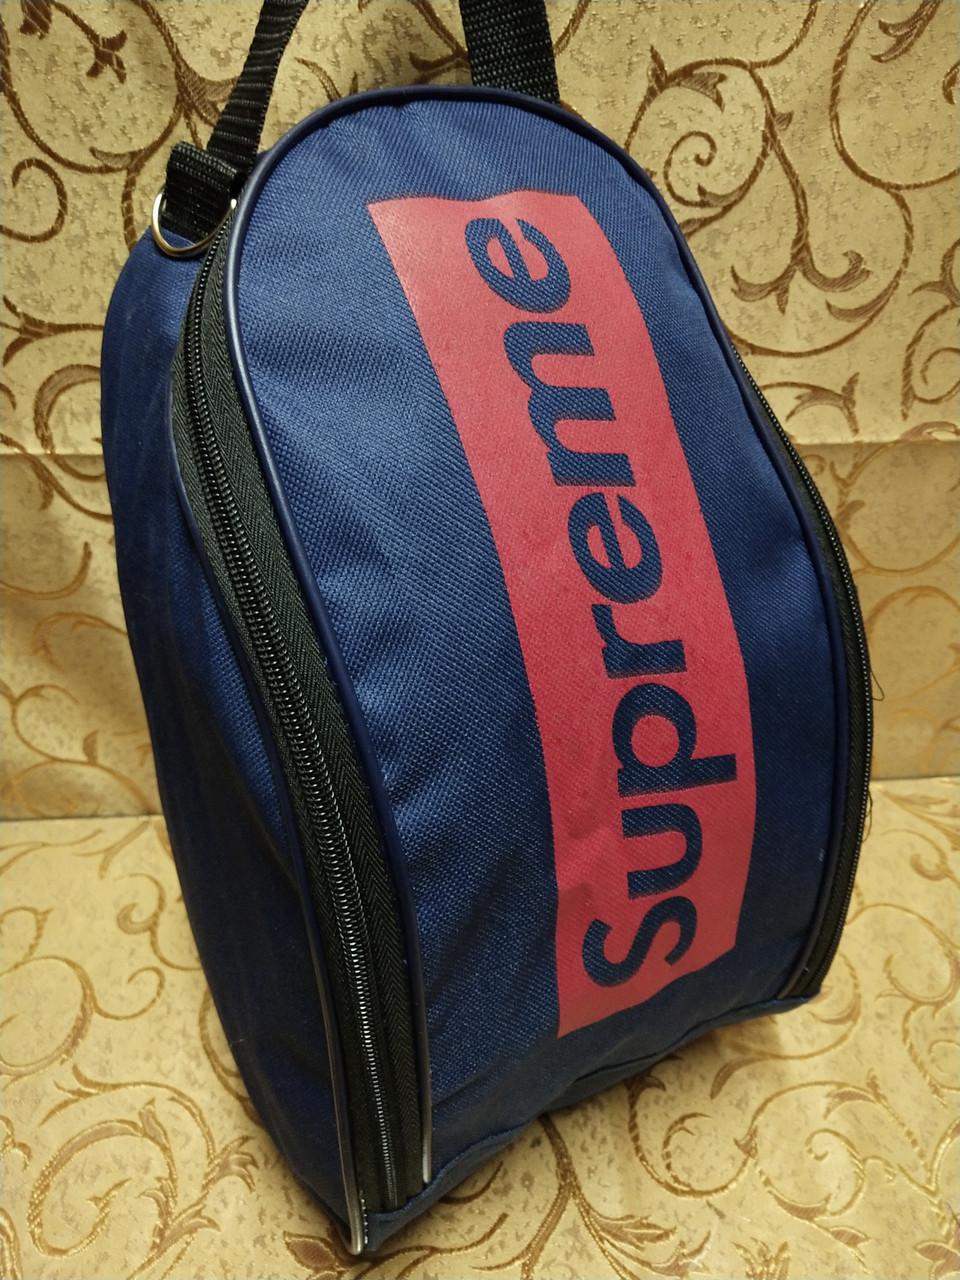 Сумка для обуви Supreme для через плечо спорт спортивные